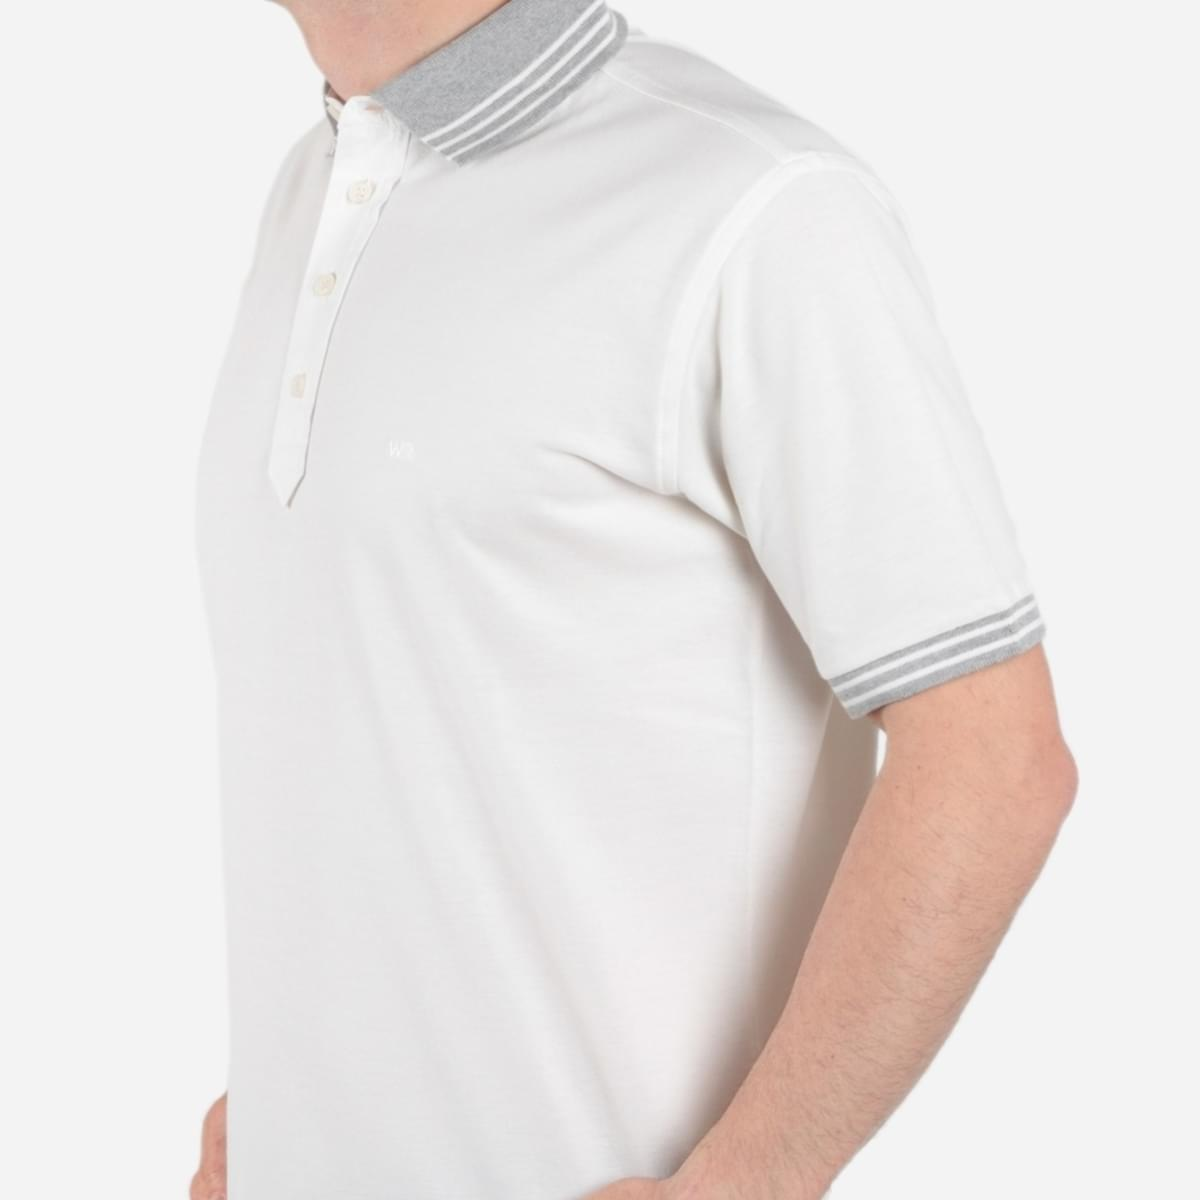 Tričko Polo Willsoor 753 M